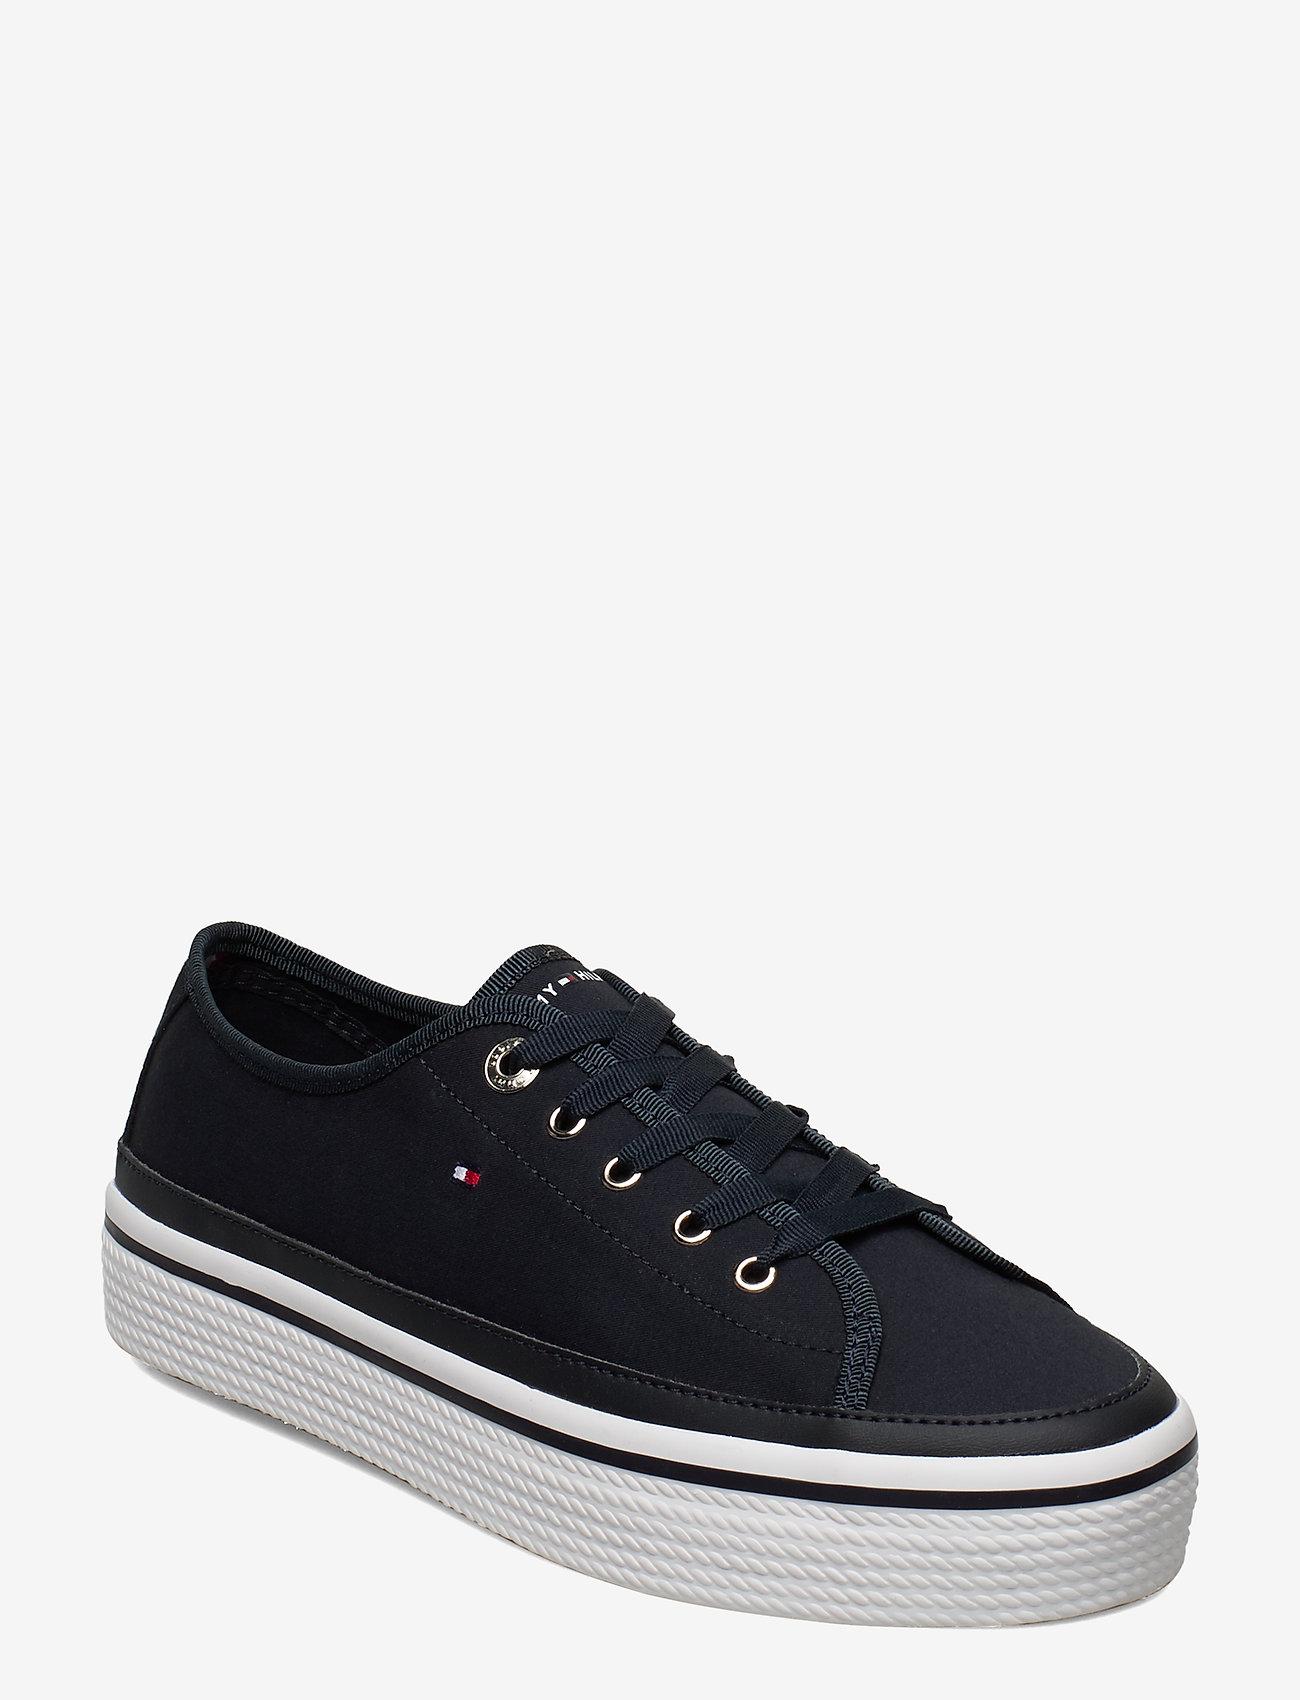 Tommy Hilfiger - CORPORATE FLATFORM SNEAKER - low top sneakers - midnight - 0